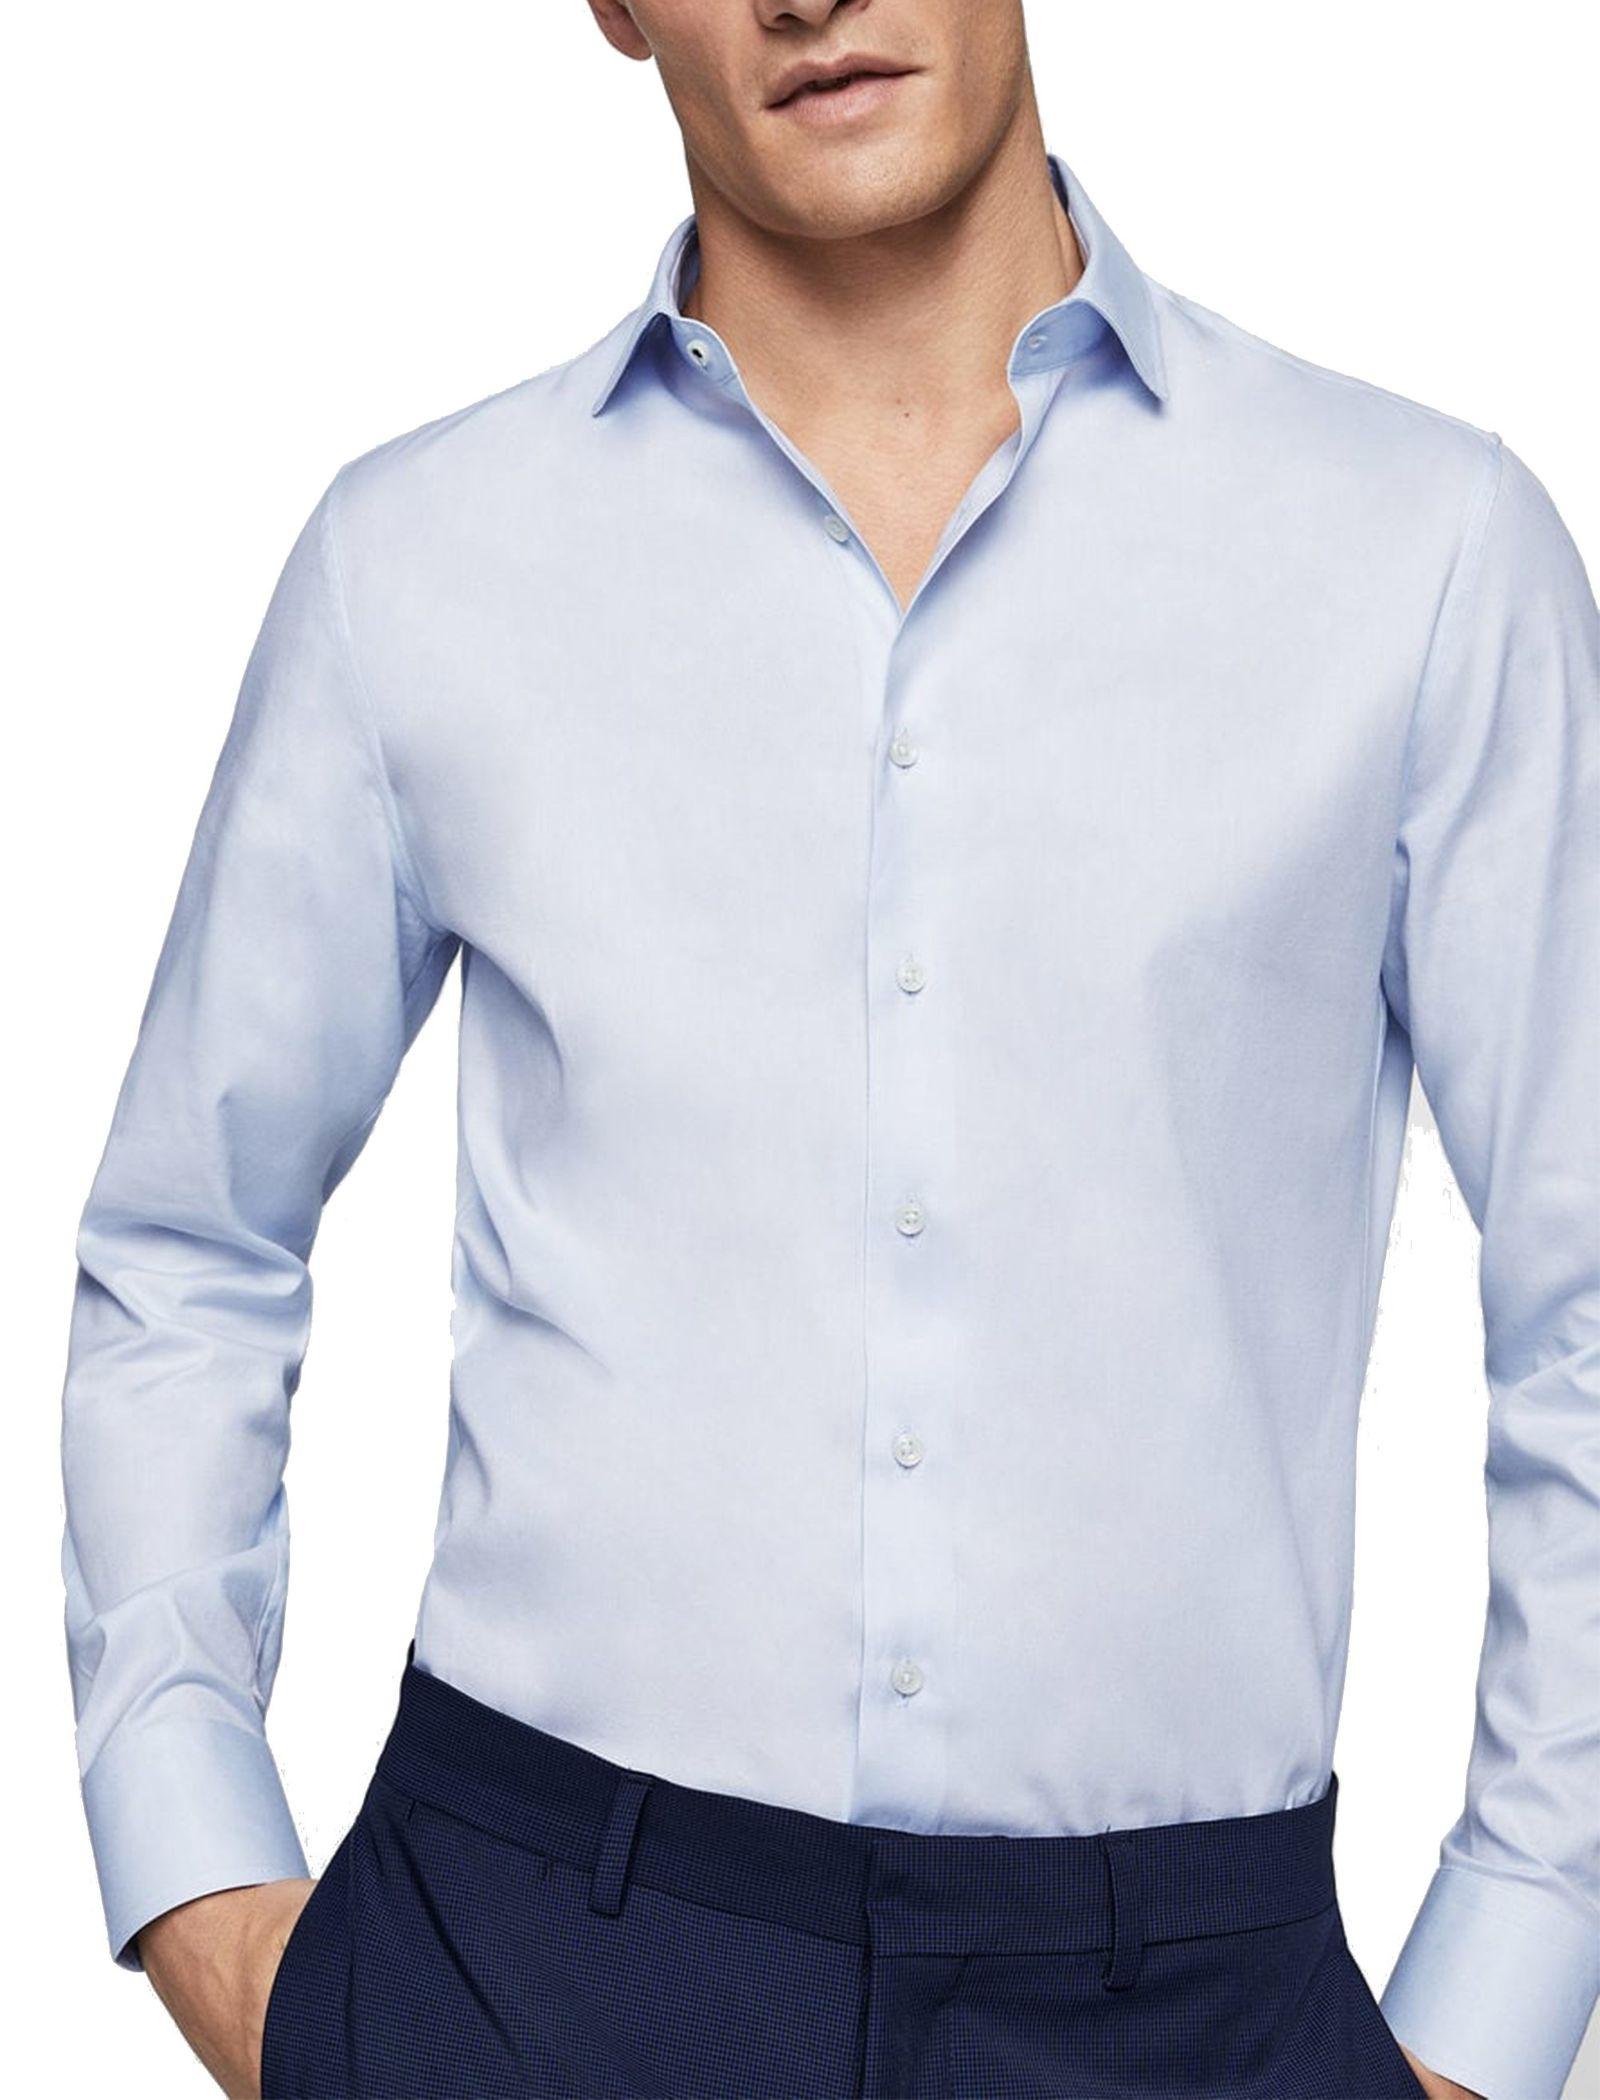 پیراهن نخی آستین بلند مردانه - مانگو - آبي روشن - 1